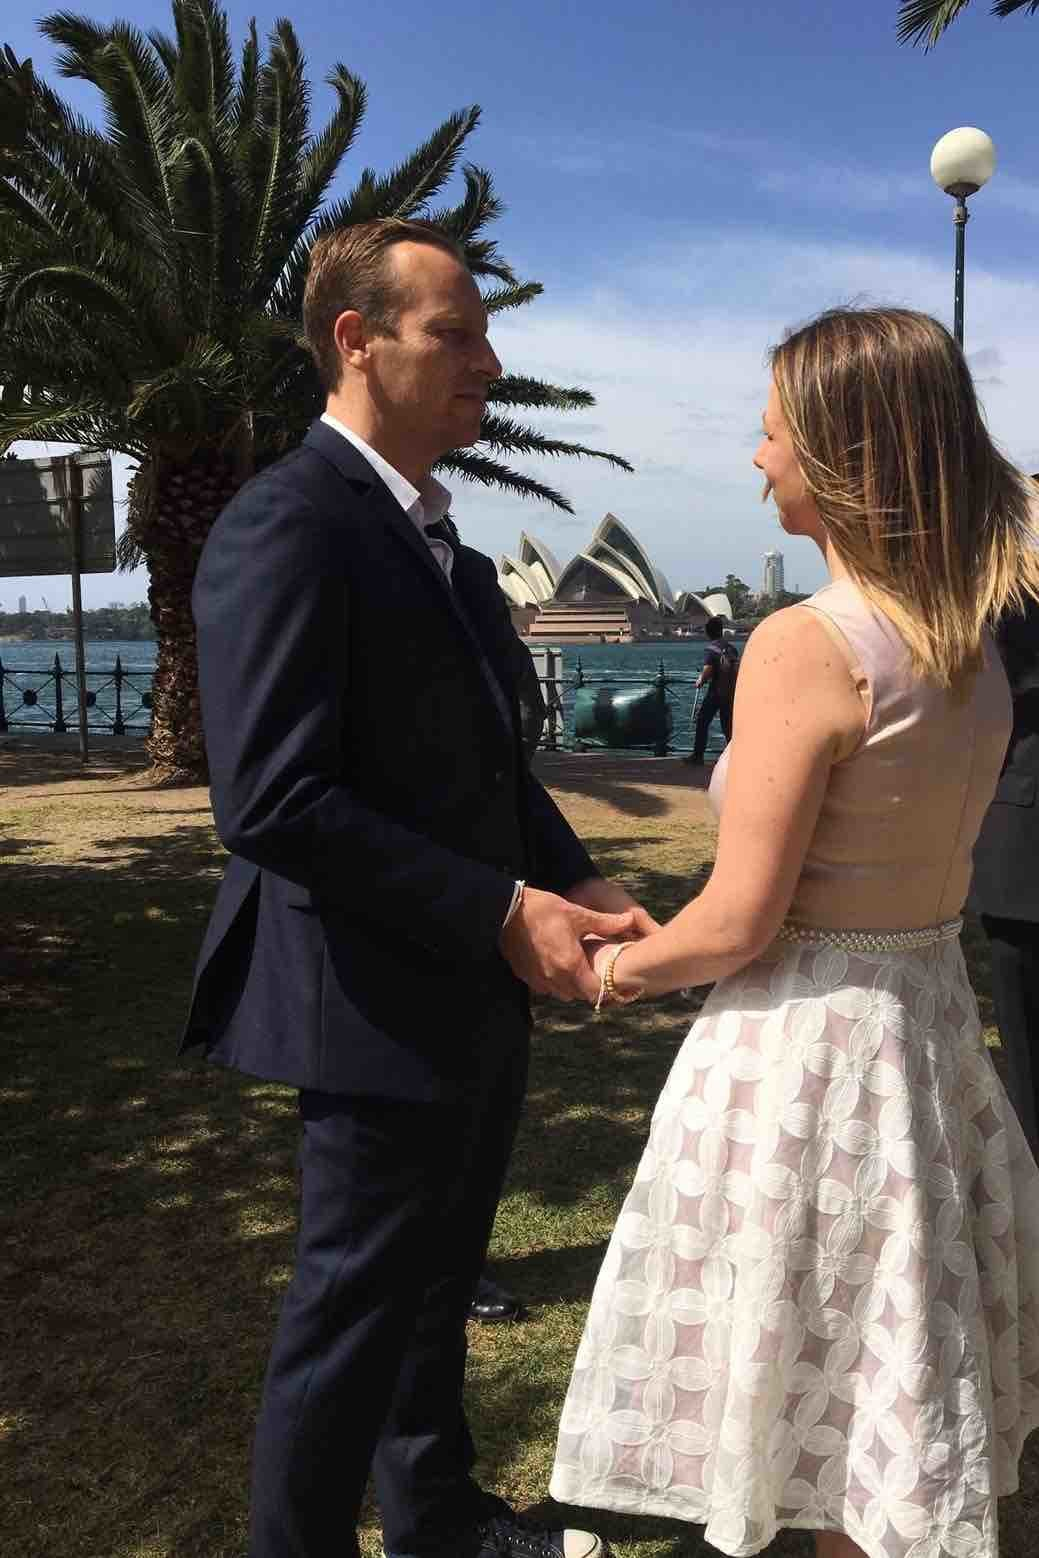 Simple-Ceremonies_Marriage Celebrant_Wedding-celebrant_Bradfield Park_North Sydney_NSW_Australia_weddingscheapSydneyHarbour2